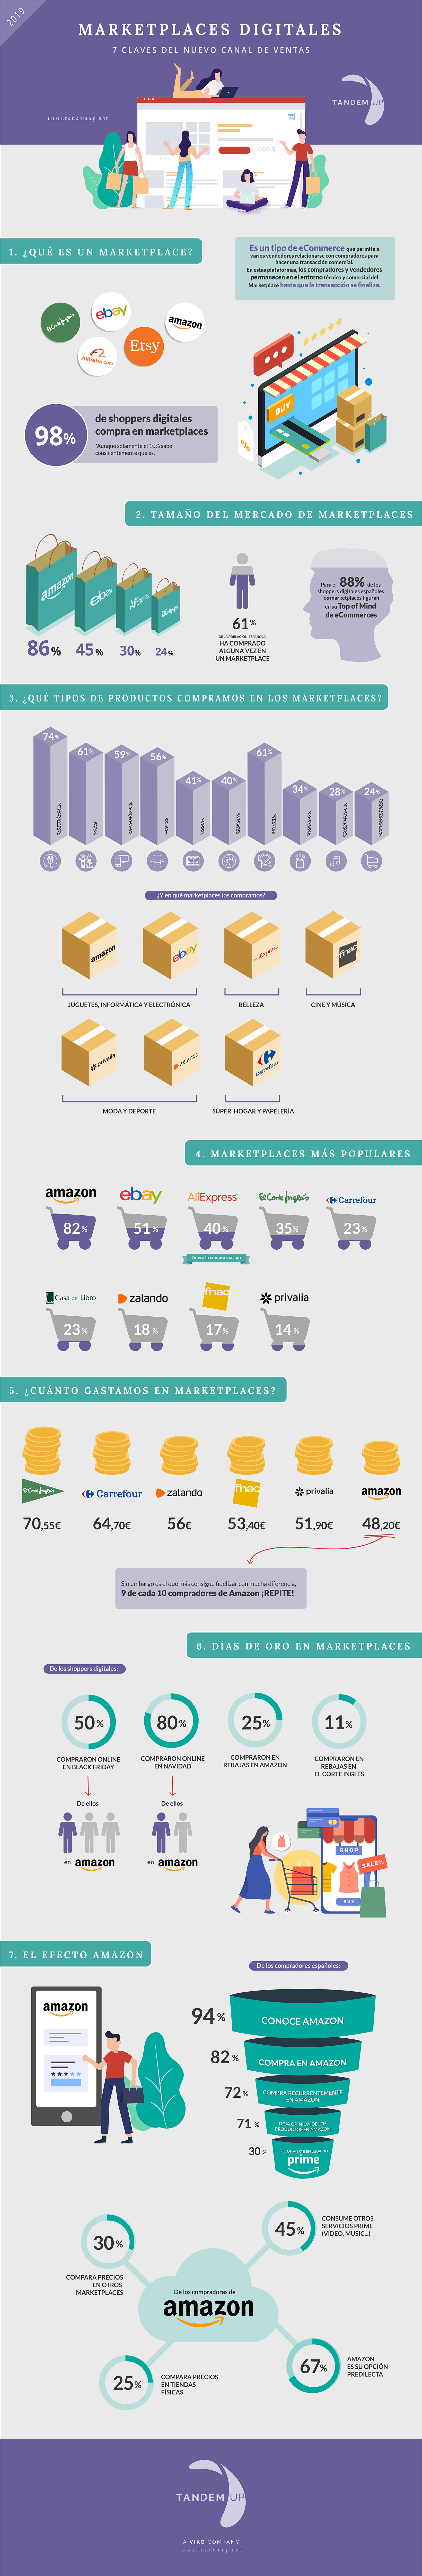 Amazon – Marketing 4 Ecommerce – Tu revista de marketing